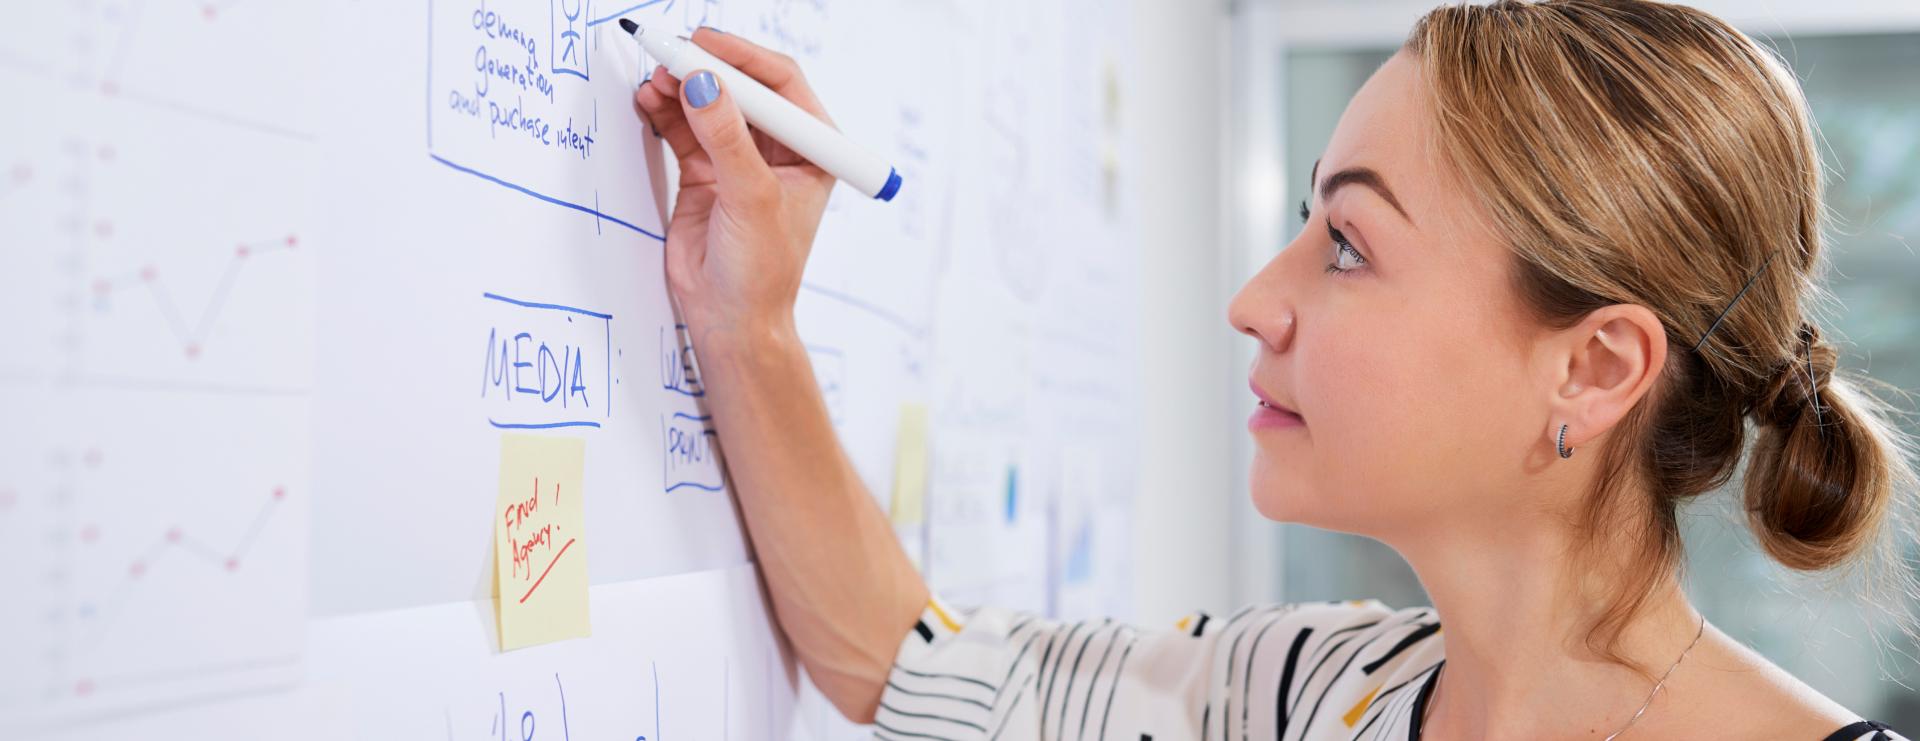 Marketing Strategist using whiteboard - concept representing digital marketing strategy